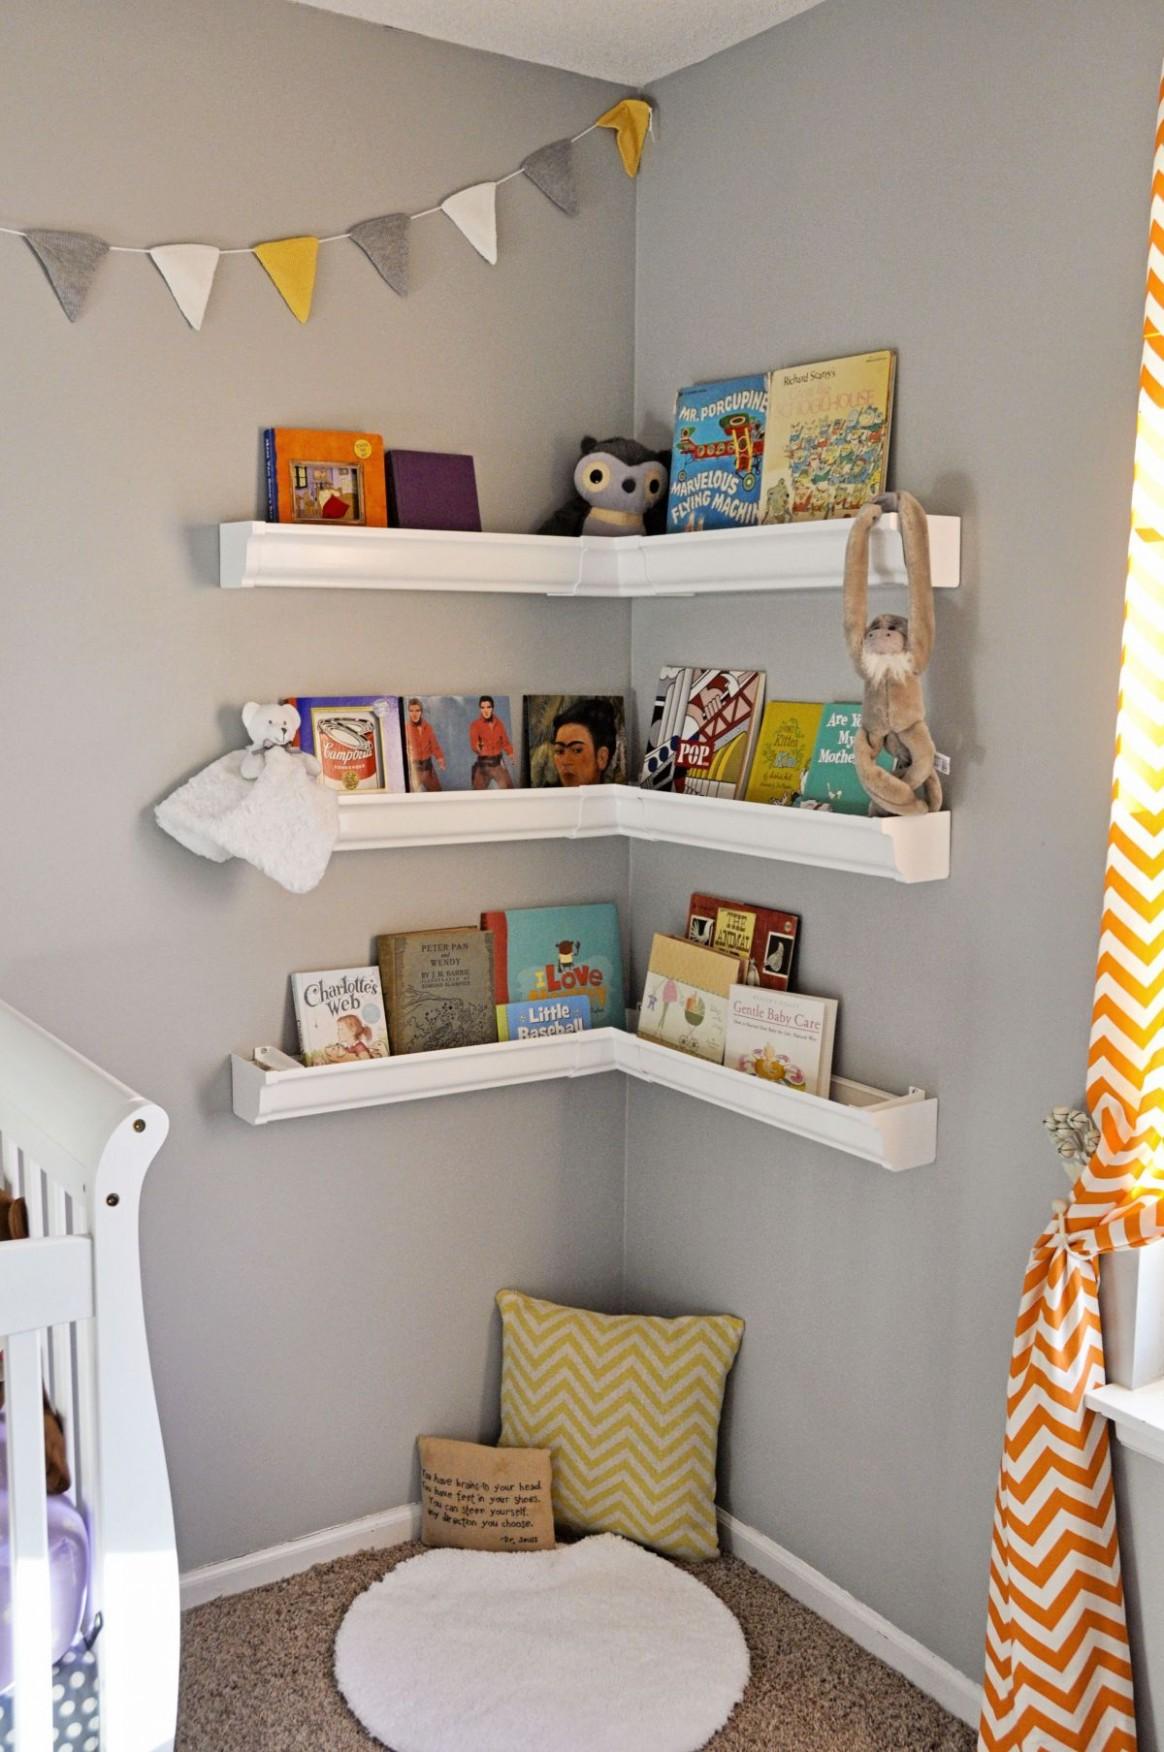 Nursery Bookshelf Ideas With Cute And Playful Designs - Baby Room Shelves